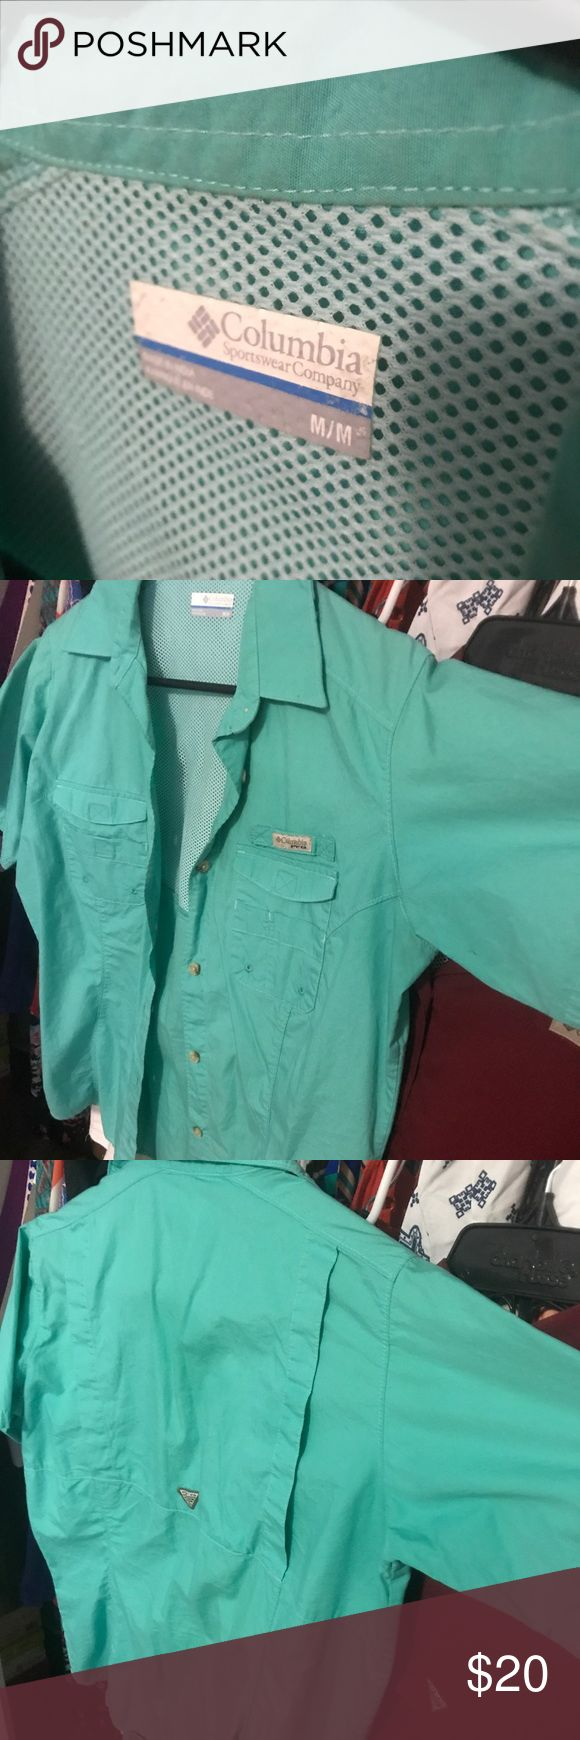 Teal Columbia PFG shirt Size medium, worn twice Columbia Tops Button Down Shirts